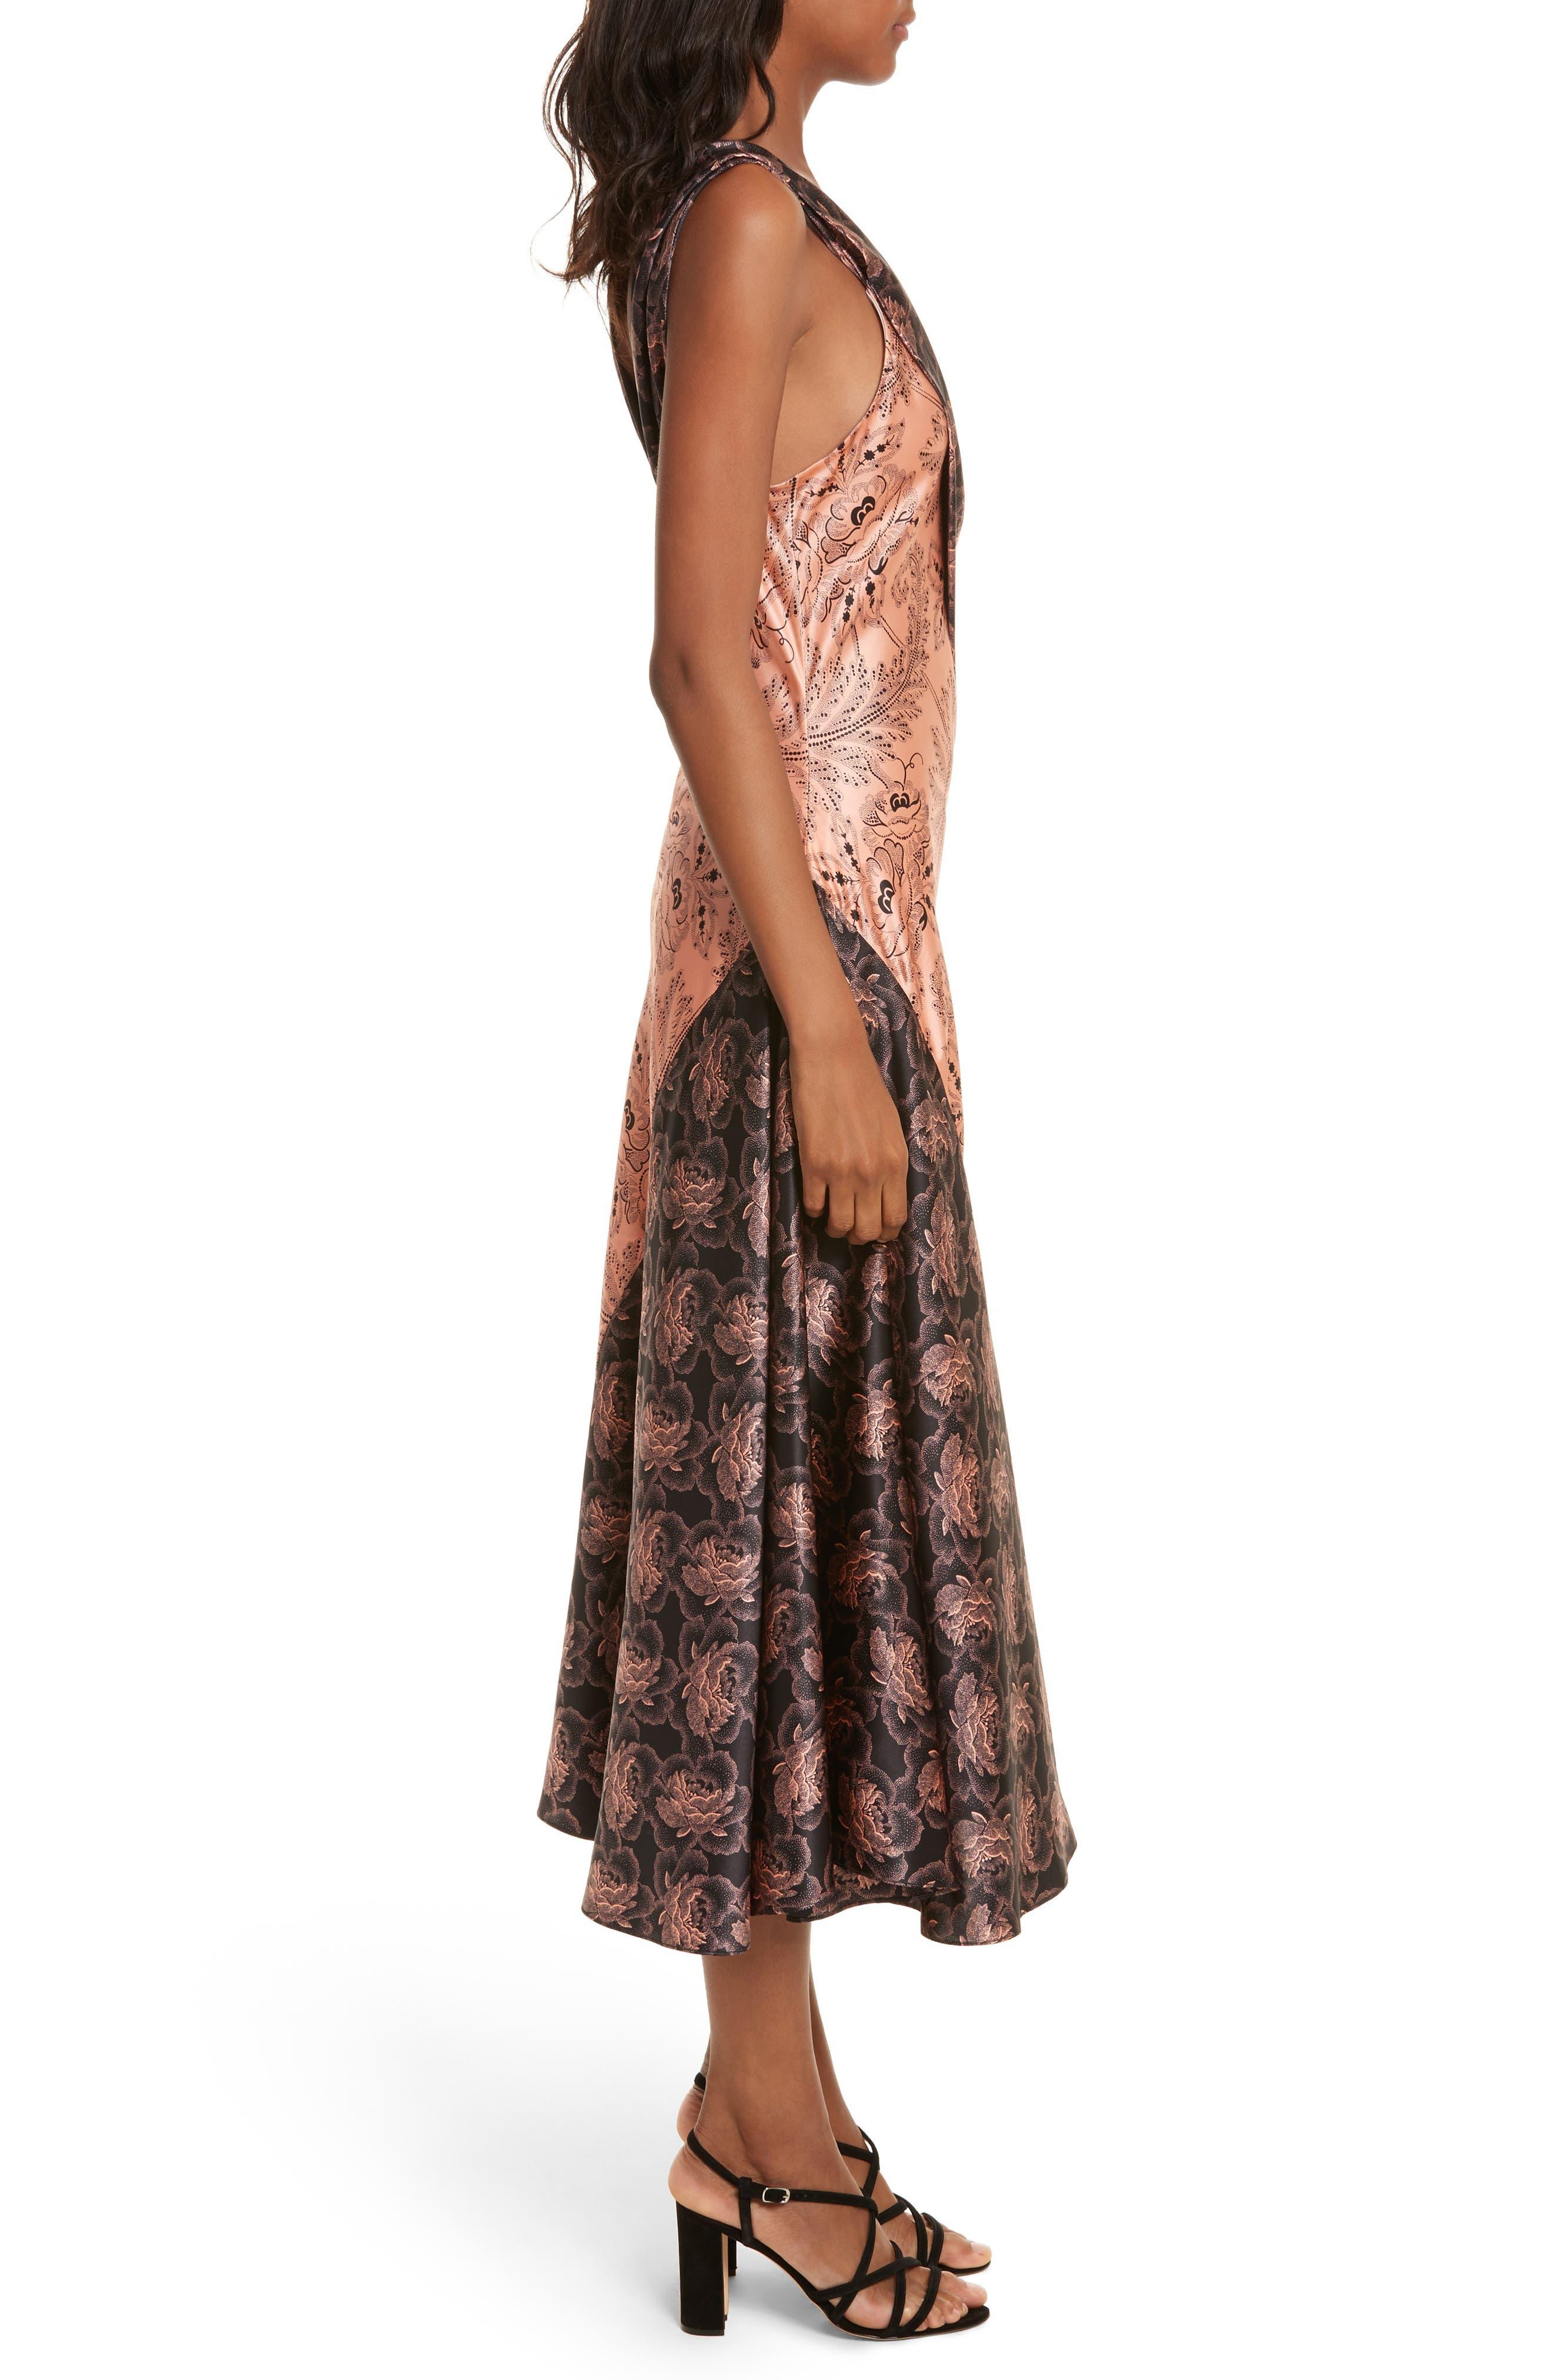 Diane von Furstenberg Draped Mixed Floral Midi Dress,                             Alternate thumbnail 3, color,                             654